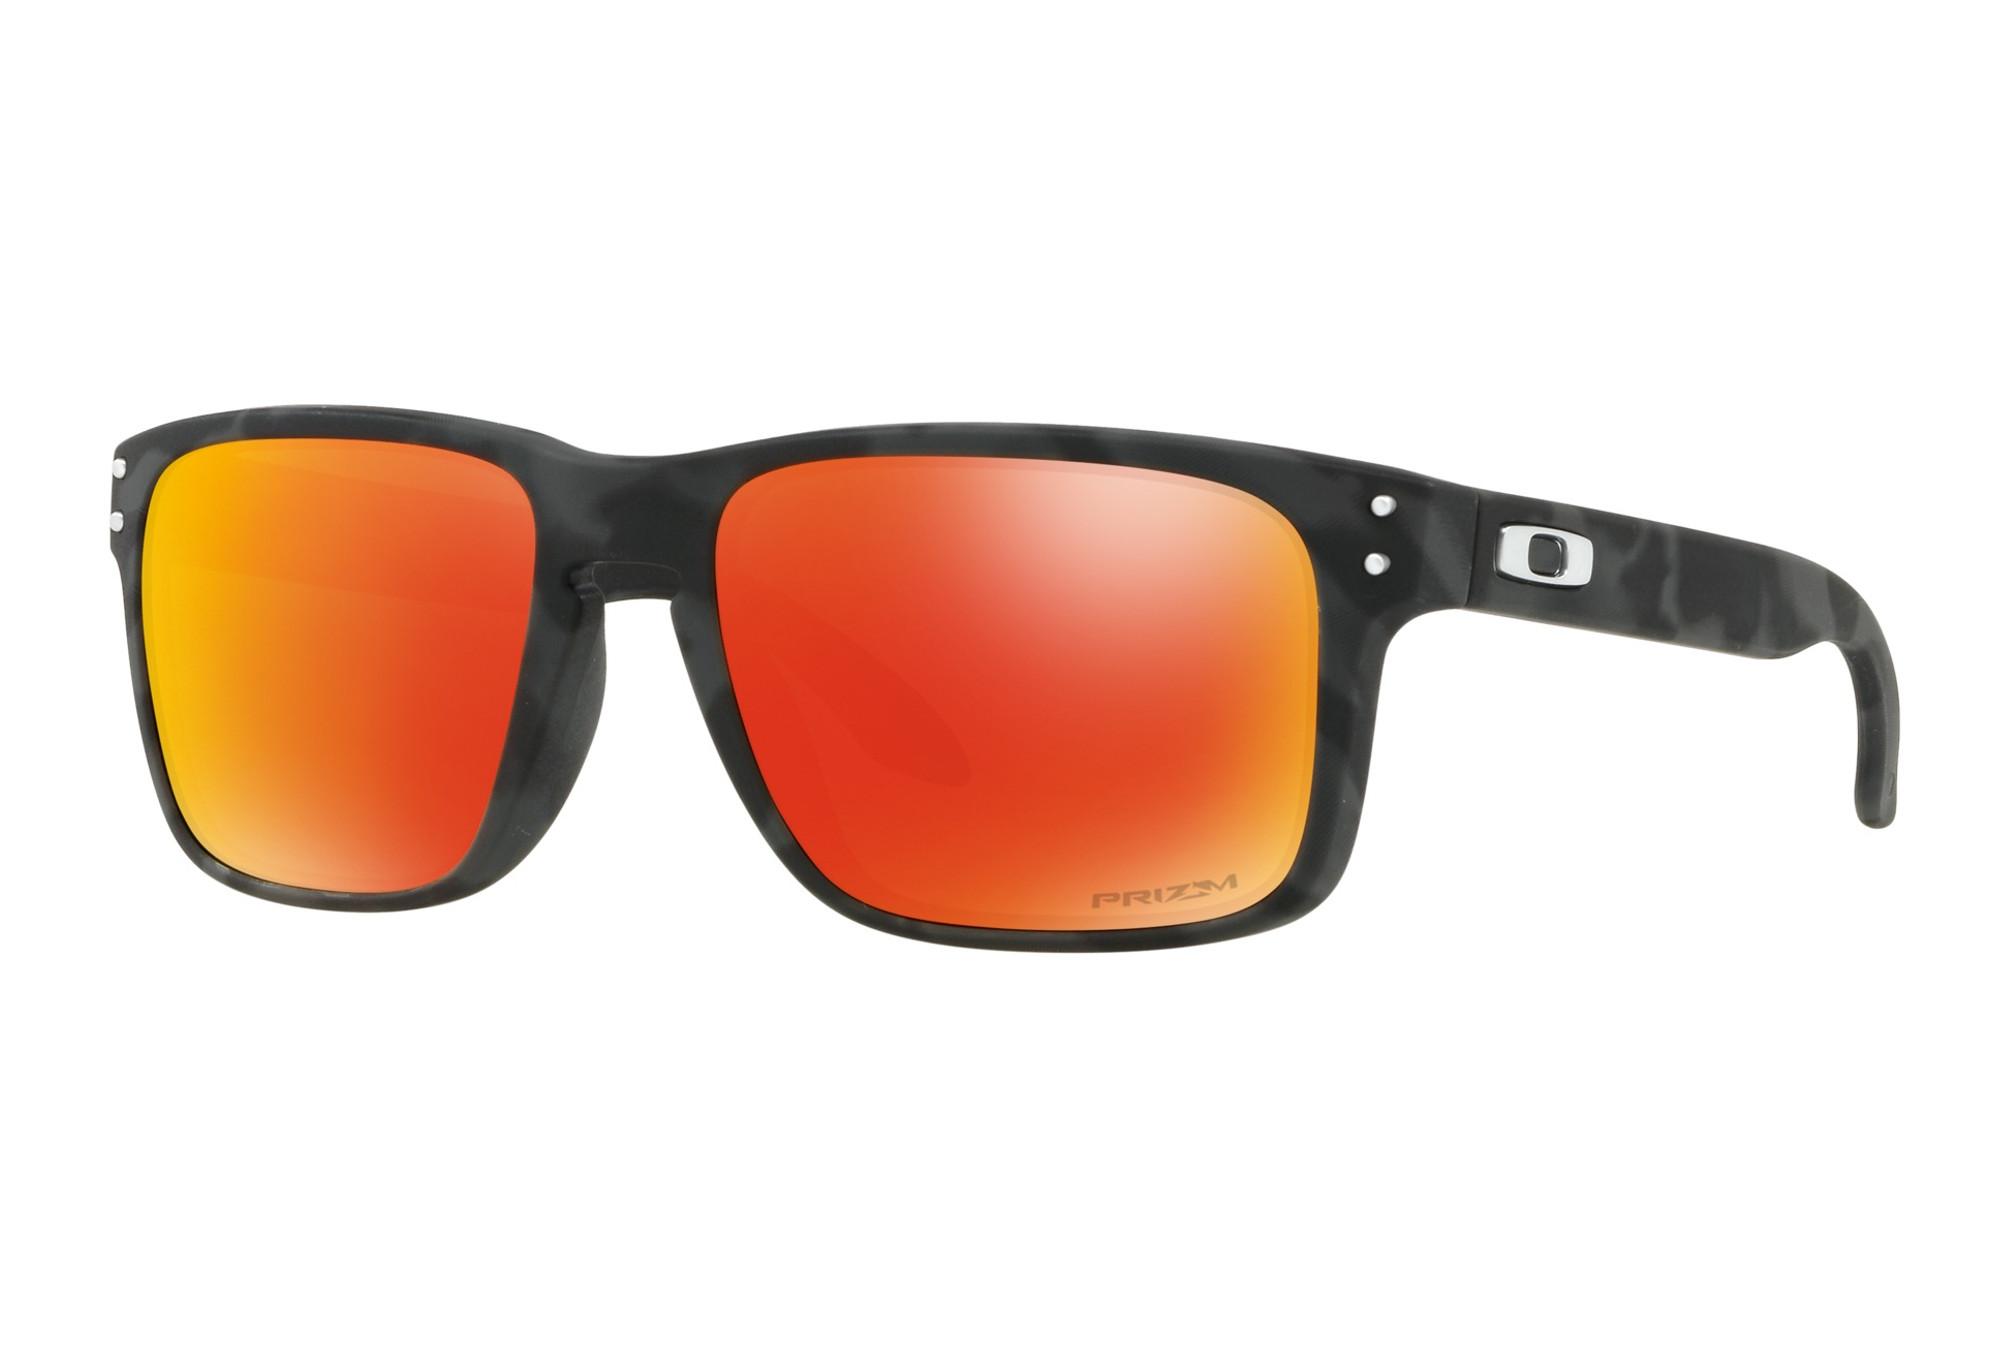 eac49034ba8 Oakley Holbrook Sunglasses Black Camo - Prizm Ruby OO9102-E955 ...